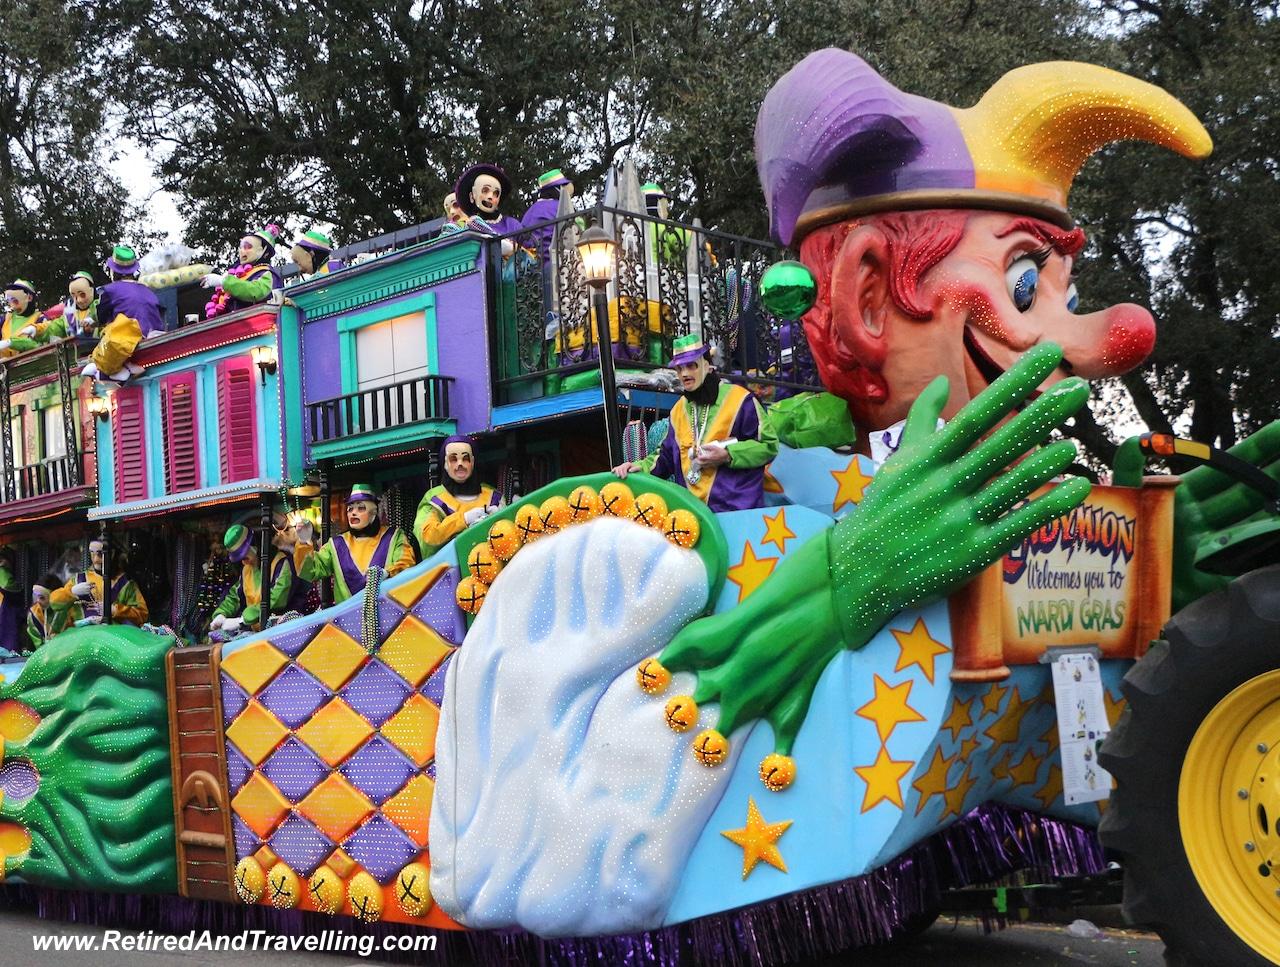 NOLA Mardi Gras - New Orleans is More Than Mardi Gras.jpg